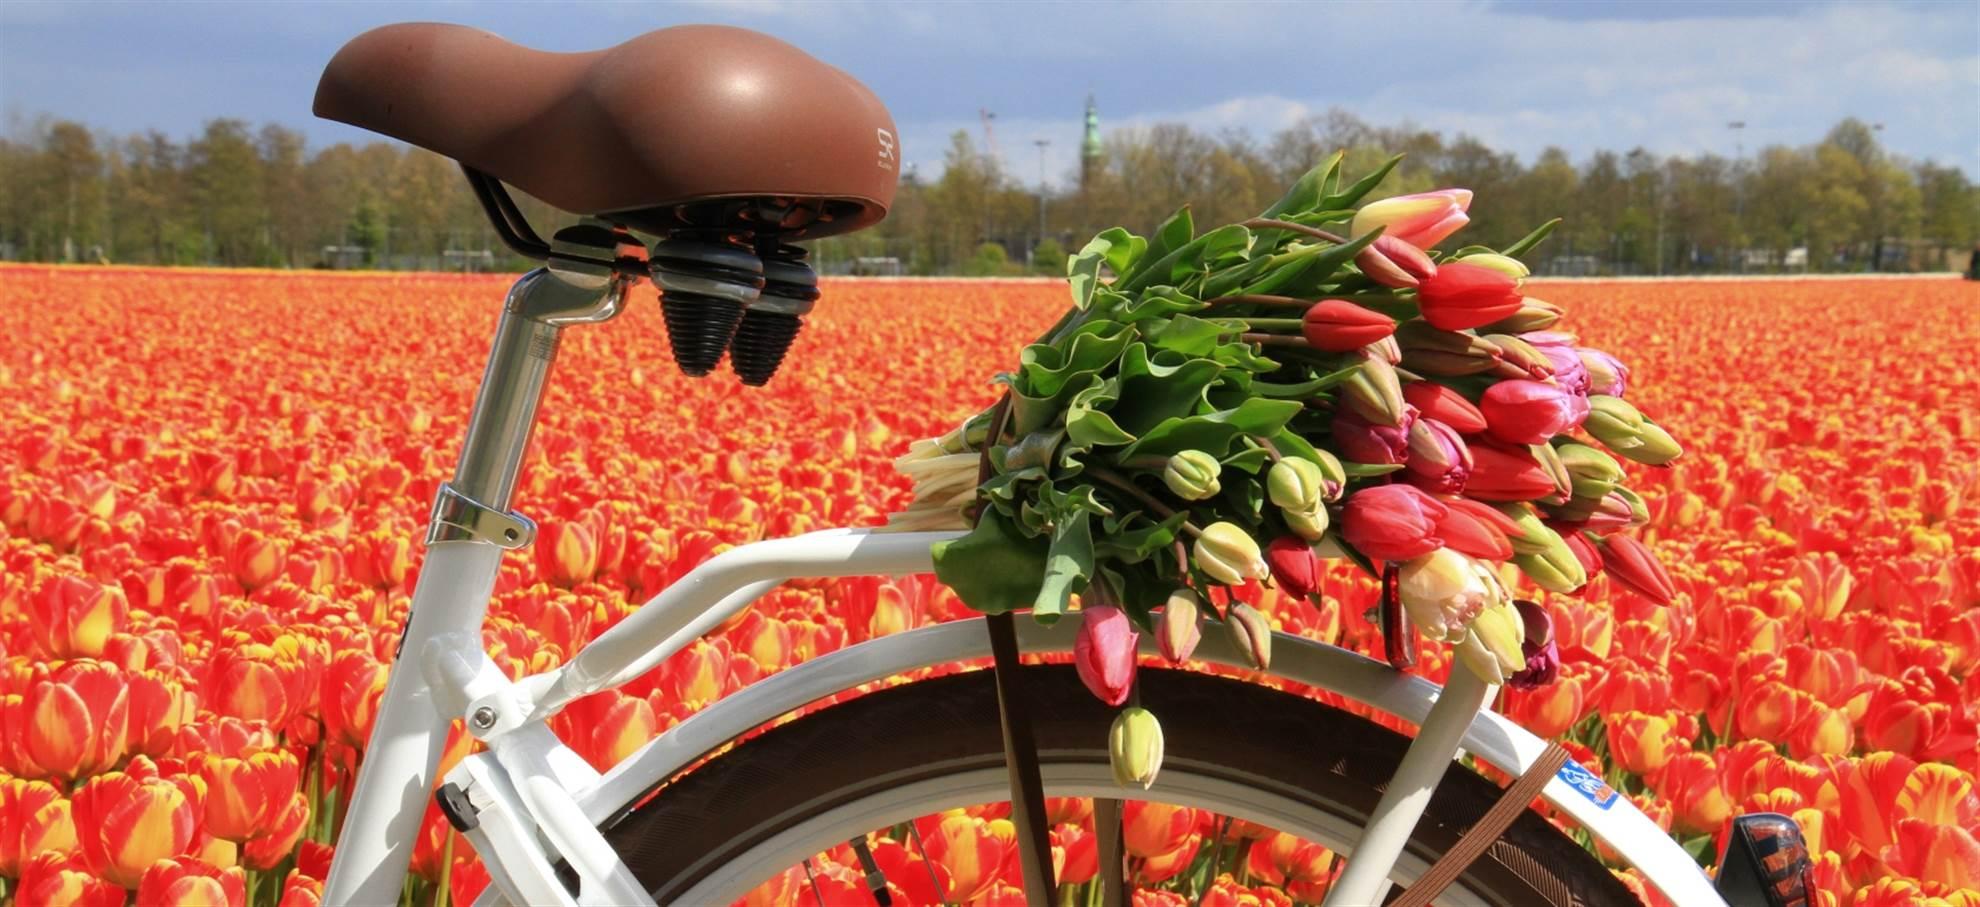 Lisse (Keukenhof) location de vélos + Guide audio Flowerfield